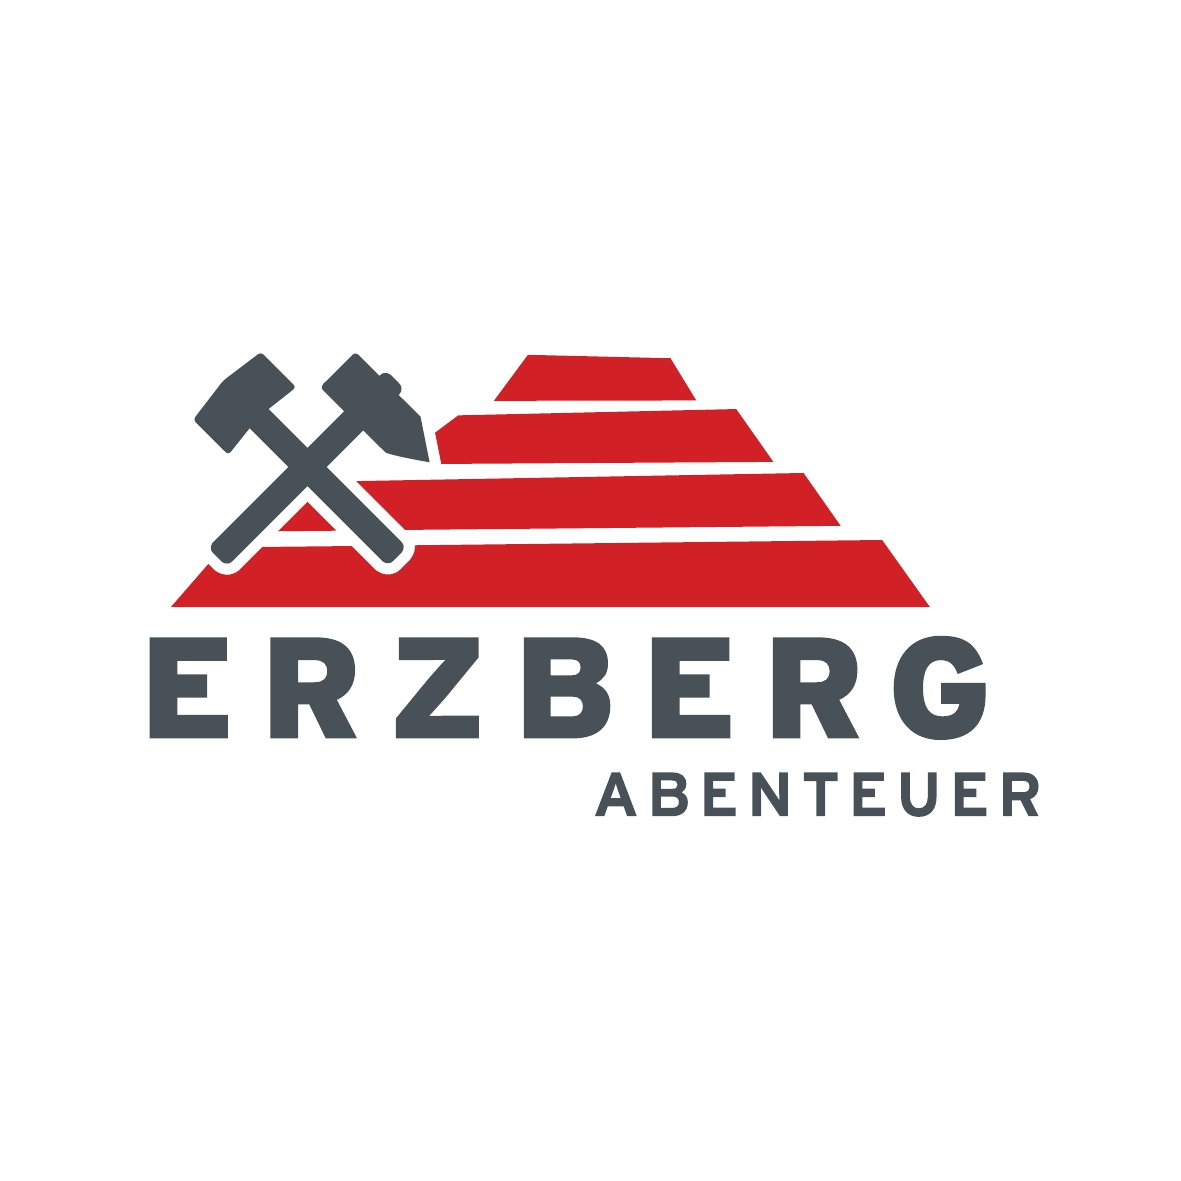 Logo Erzberg Abenteuer 4c ZW